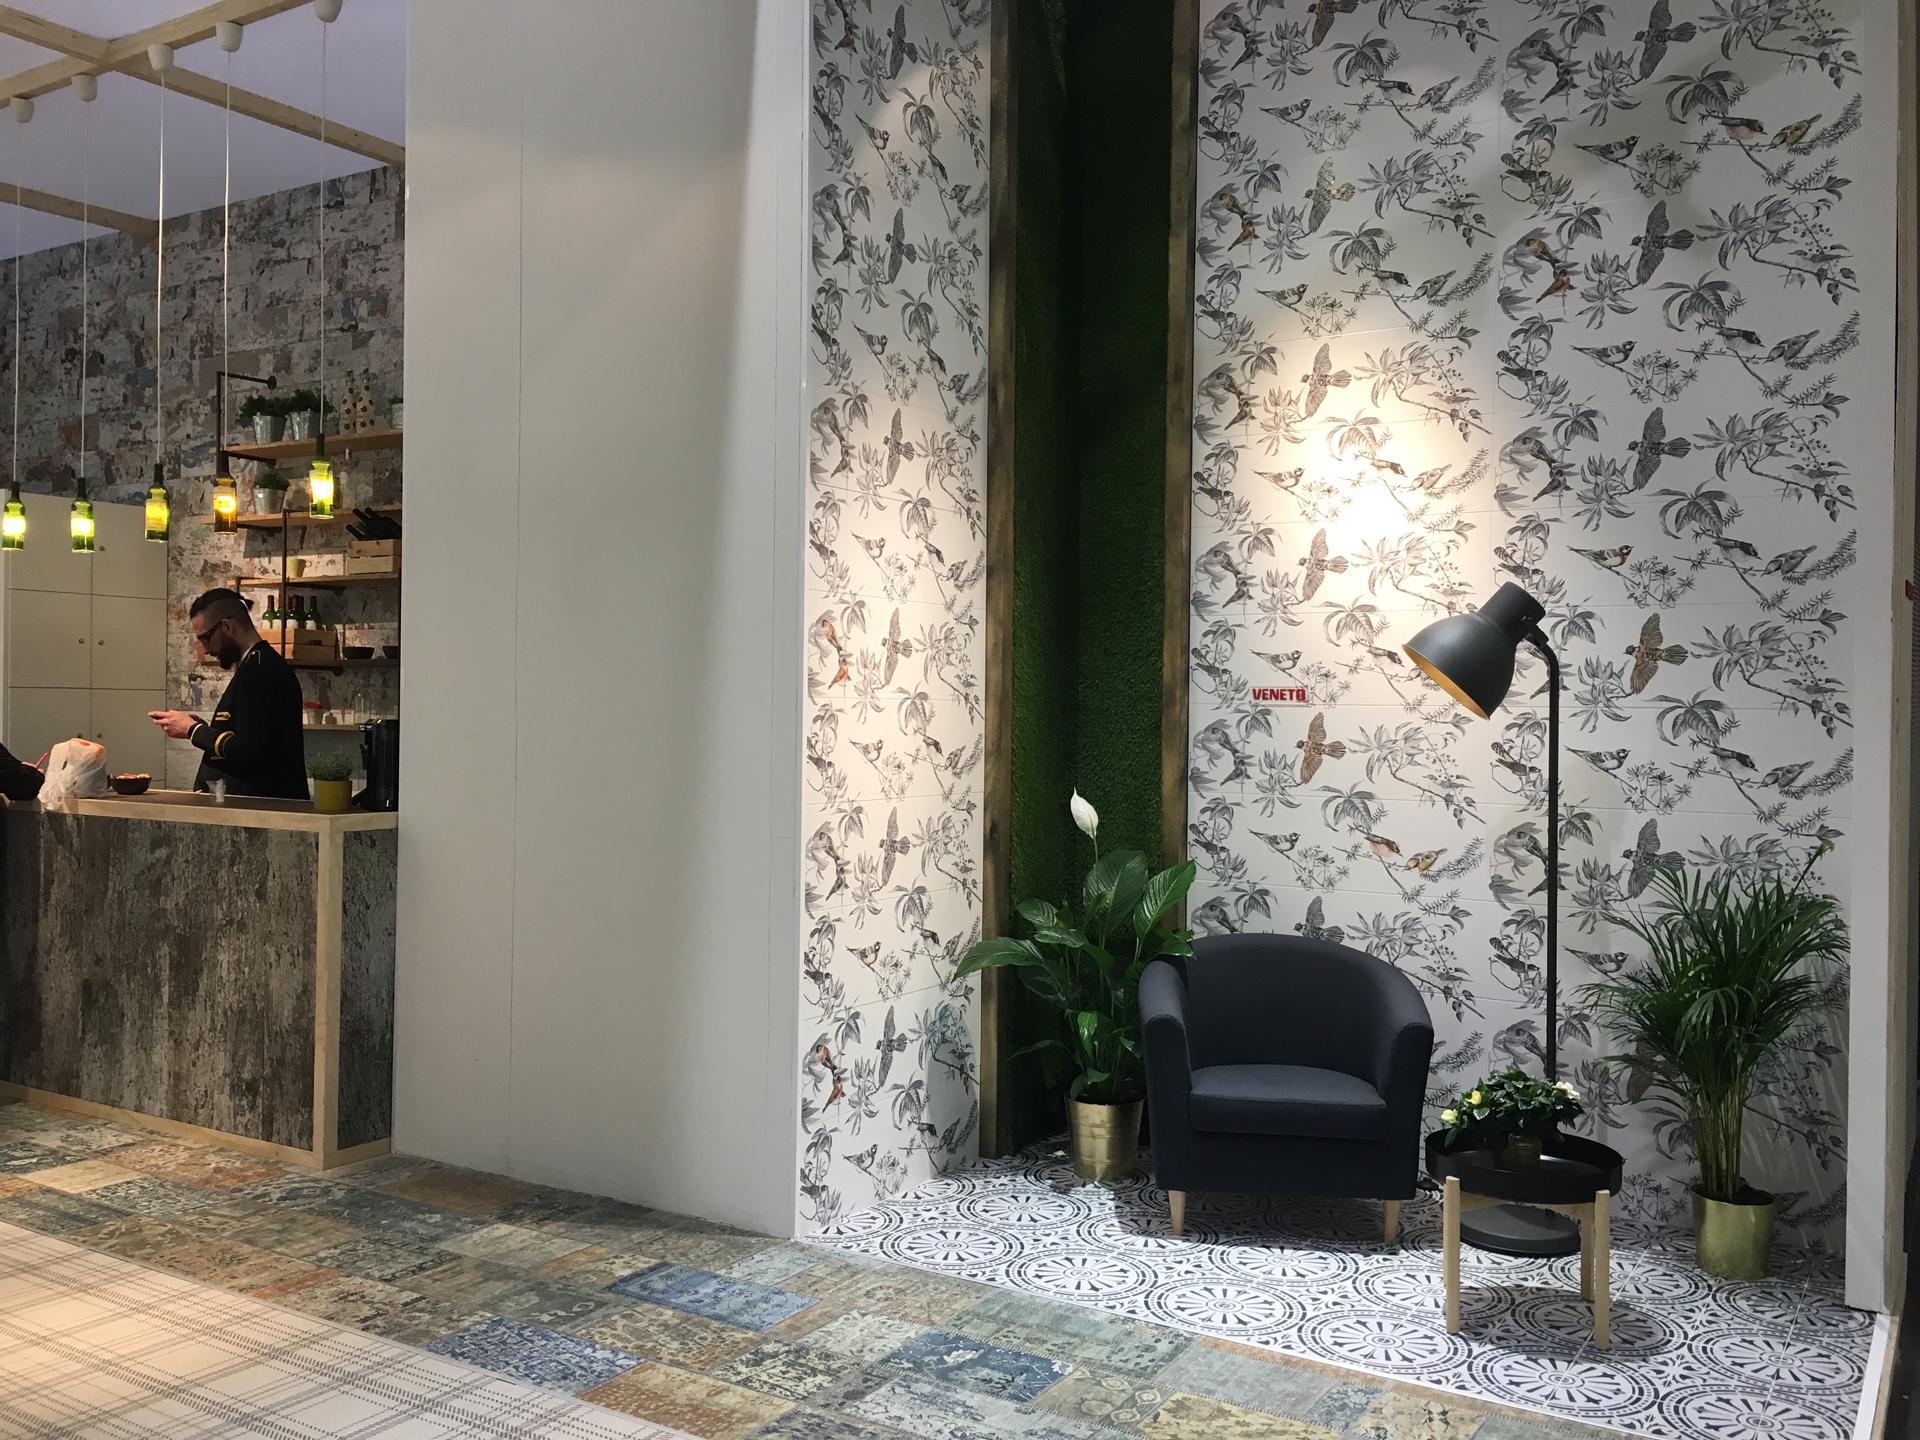 feria-cevisama-valencia-2018-decoracion-interiorismo-3